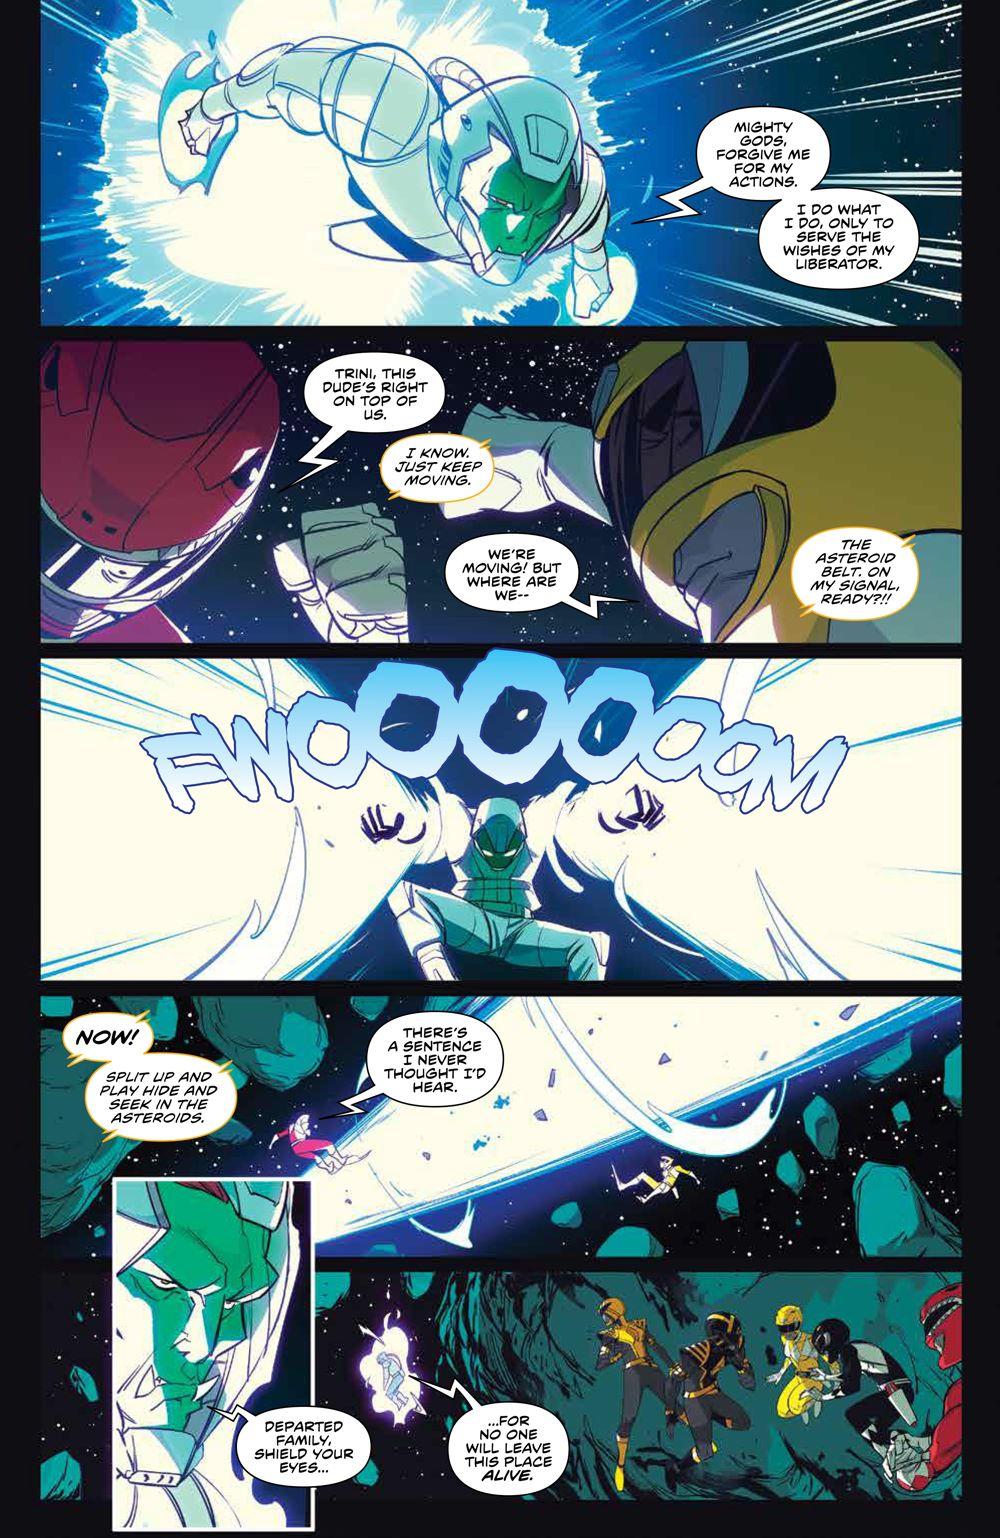 MMPR_v13_SC_PRESS_15 ComicList Previews: MIGHTY MORPHIN POWER RANGERS VOLUME 13 TP